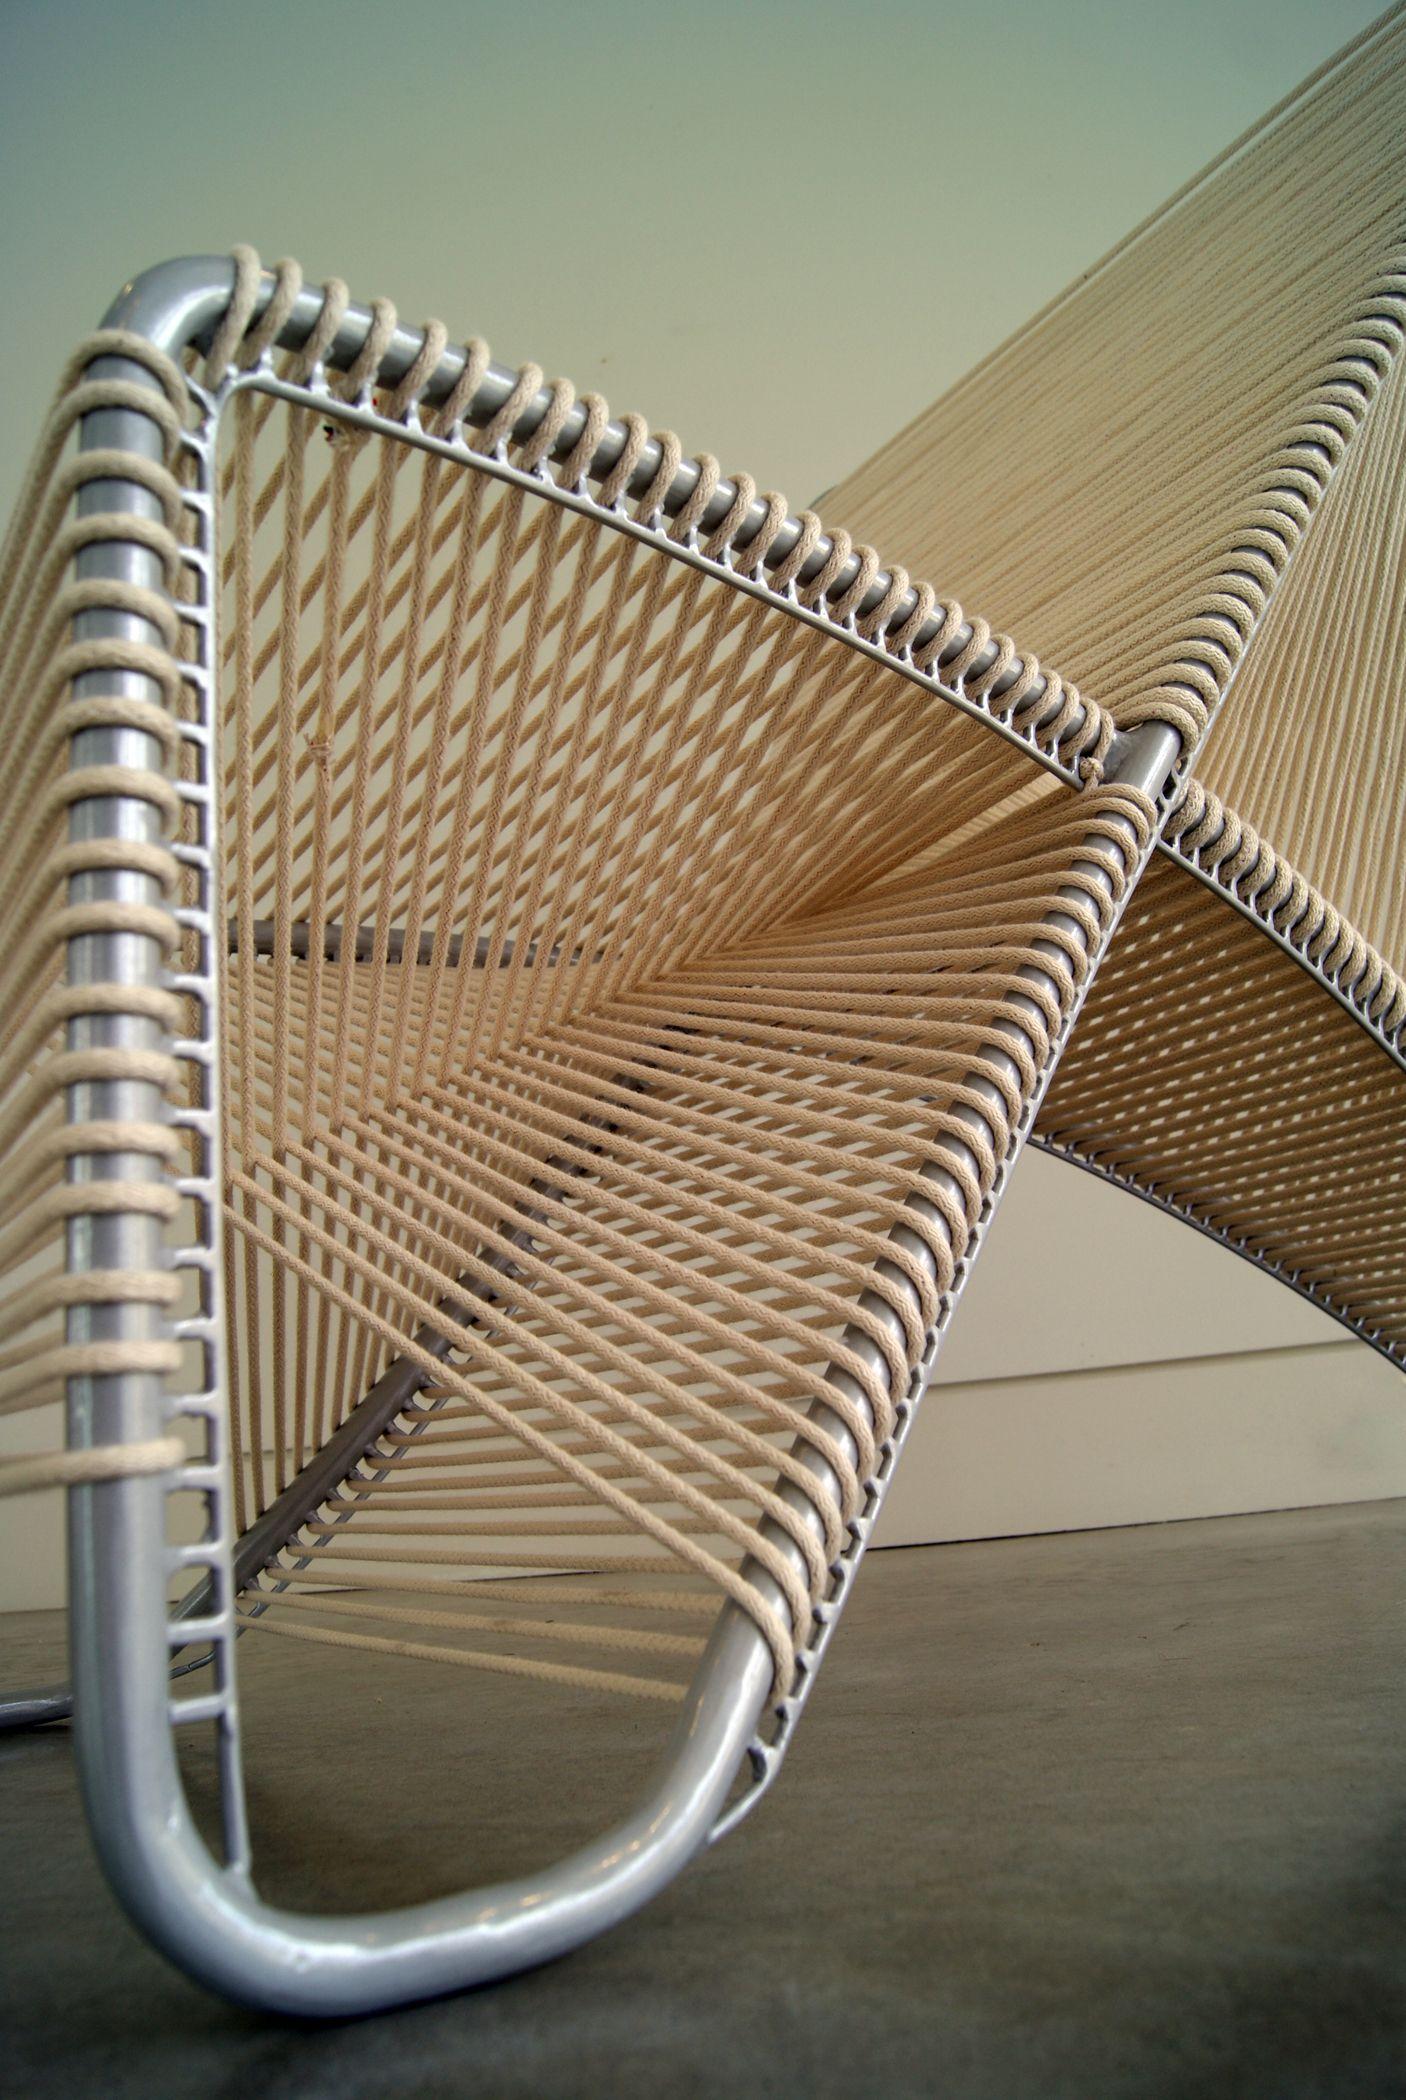 Weave Chair By Mariel Penner Wilson At Coroflot.com